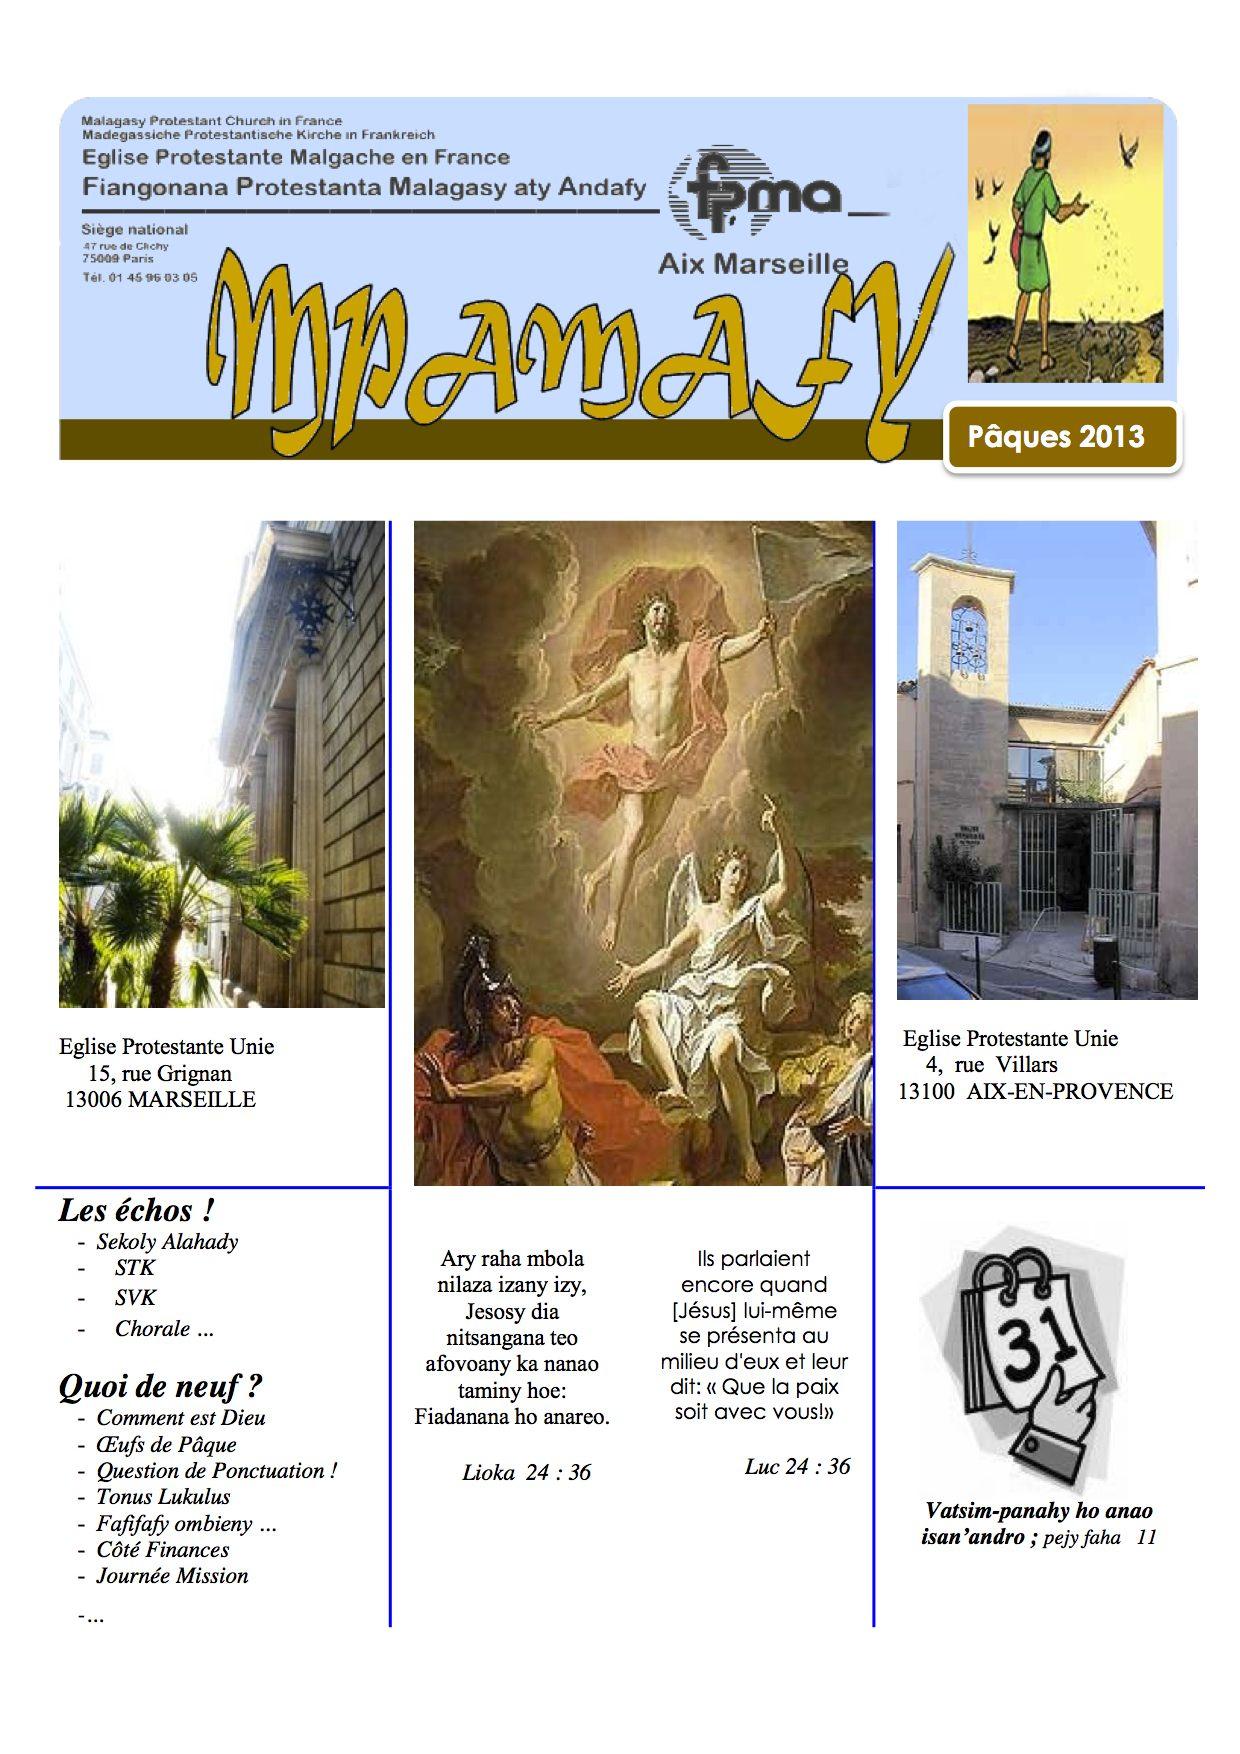 mpamafy paques 2013